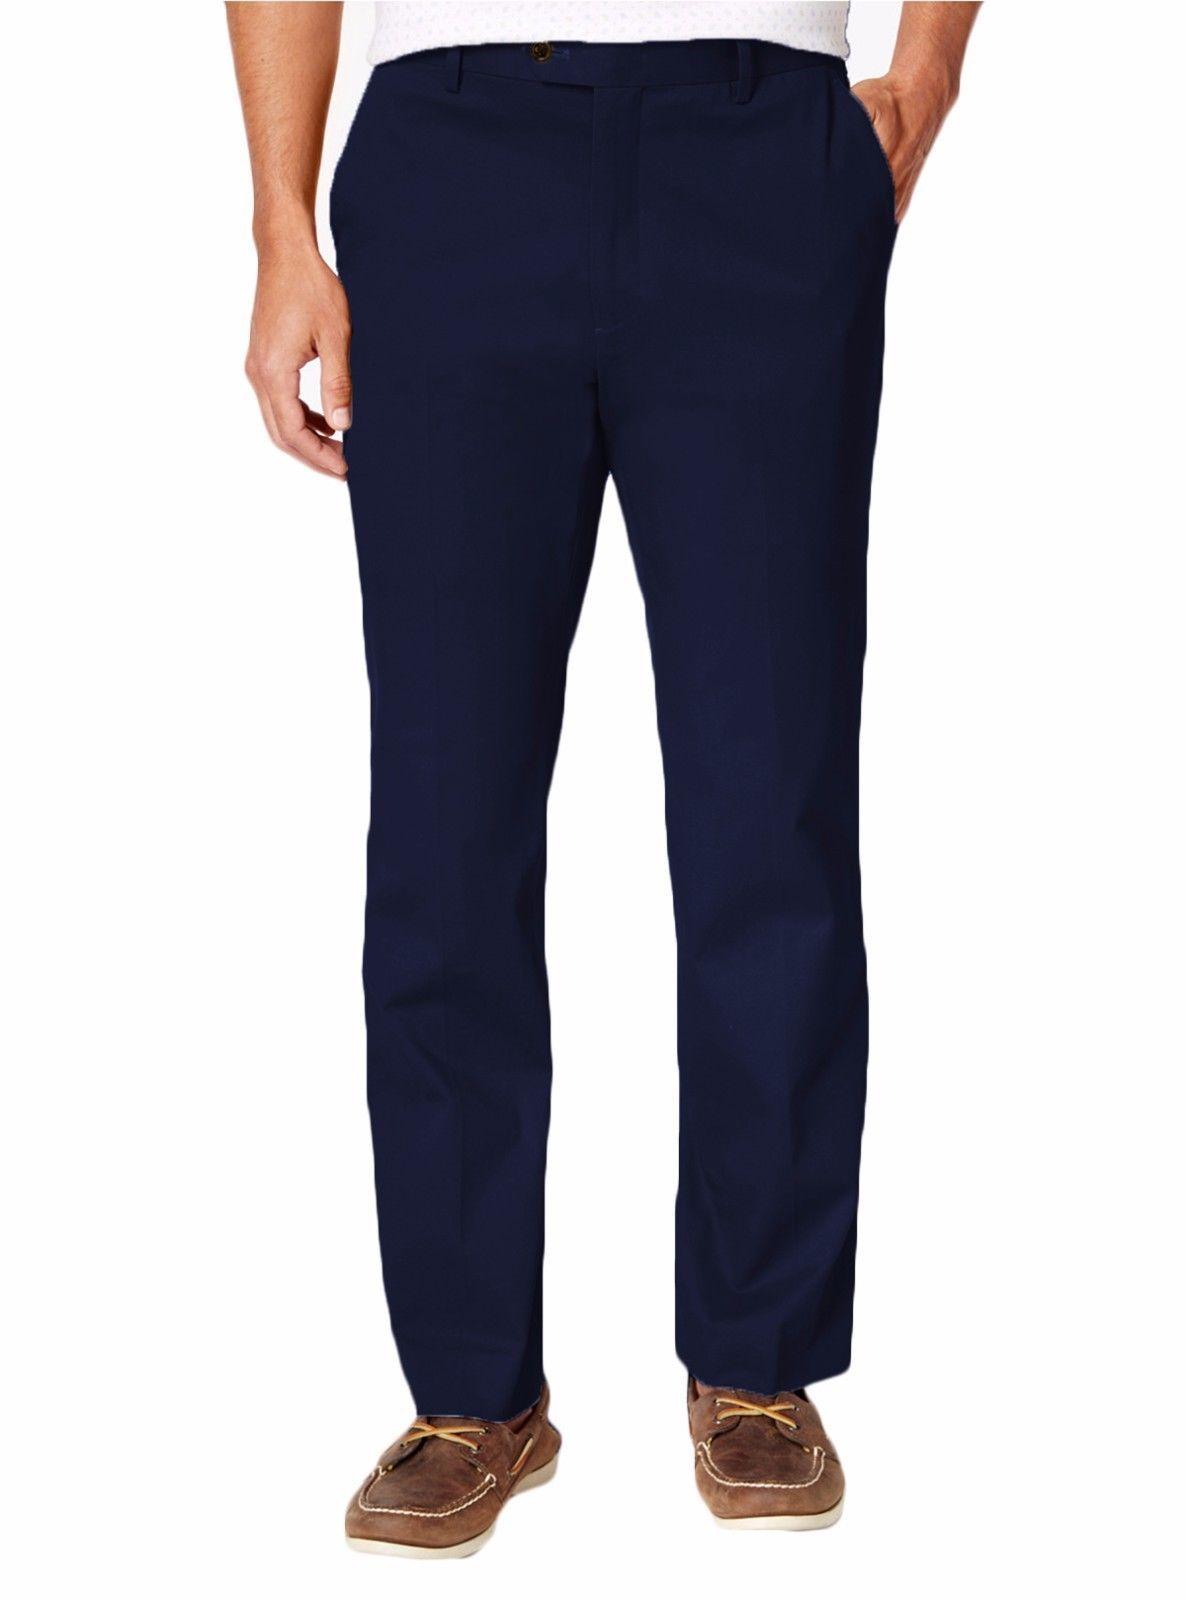 NEW MENS TASSO ELBA SIGNATURE CHINO FLAT FRONT BLUE NAVY PANTS - $22.99